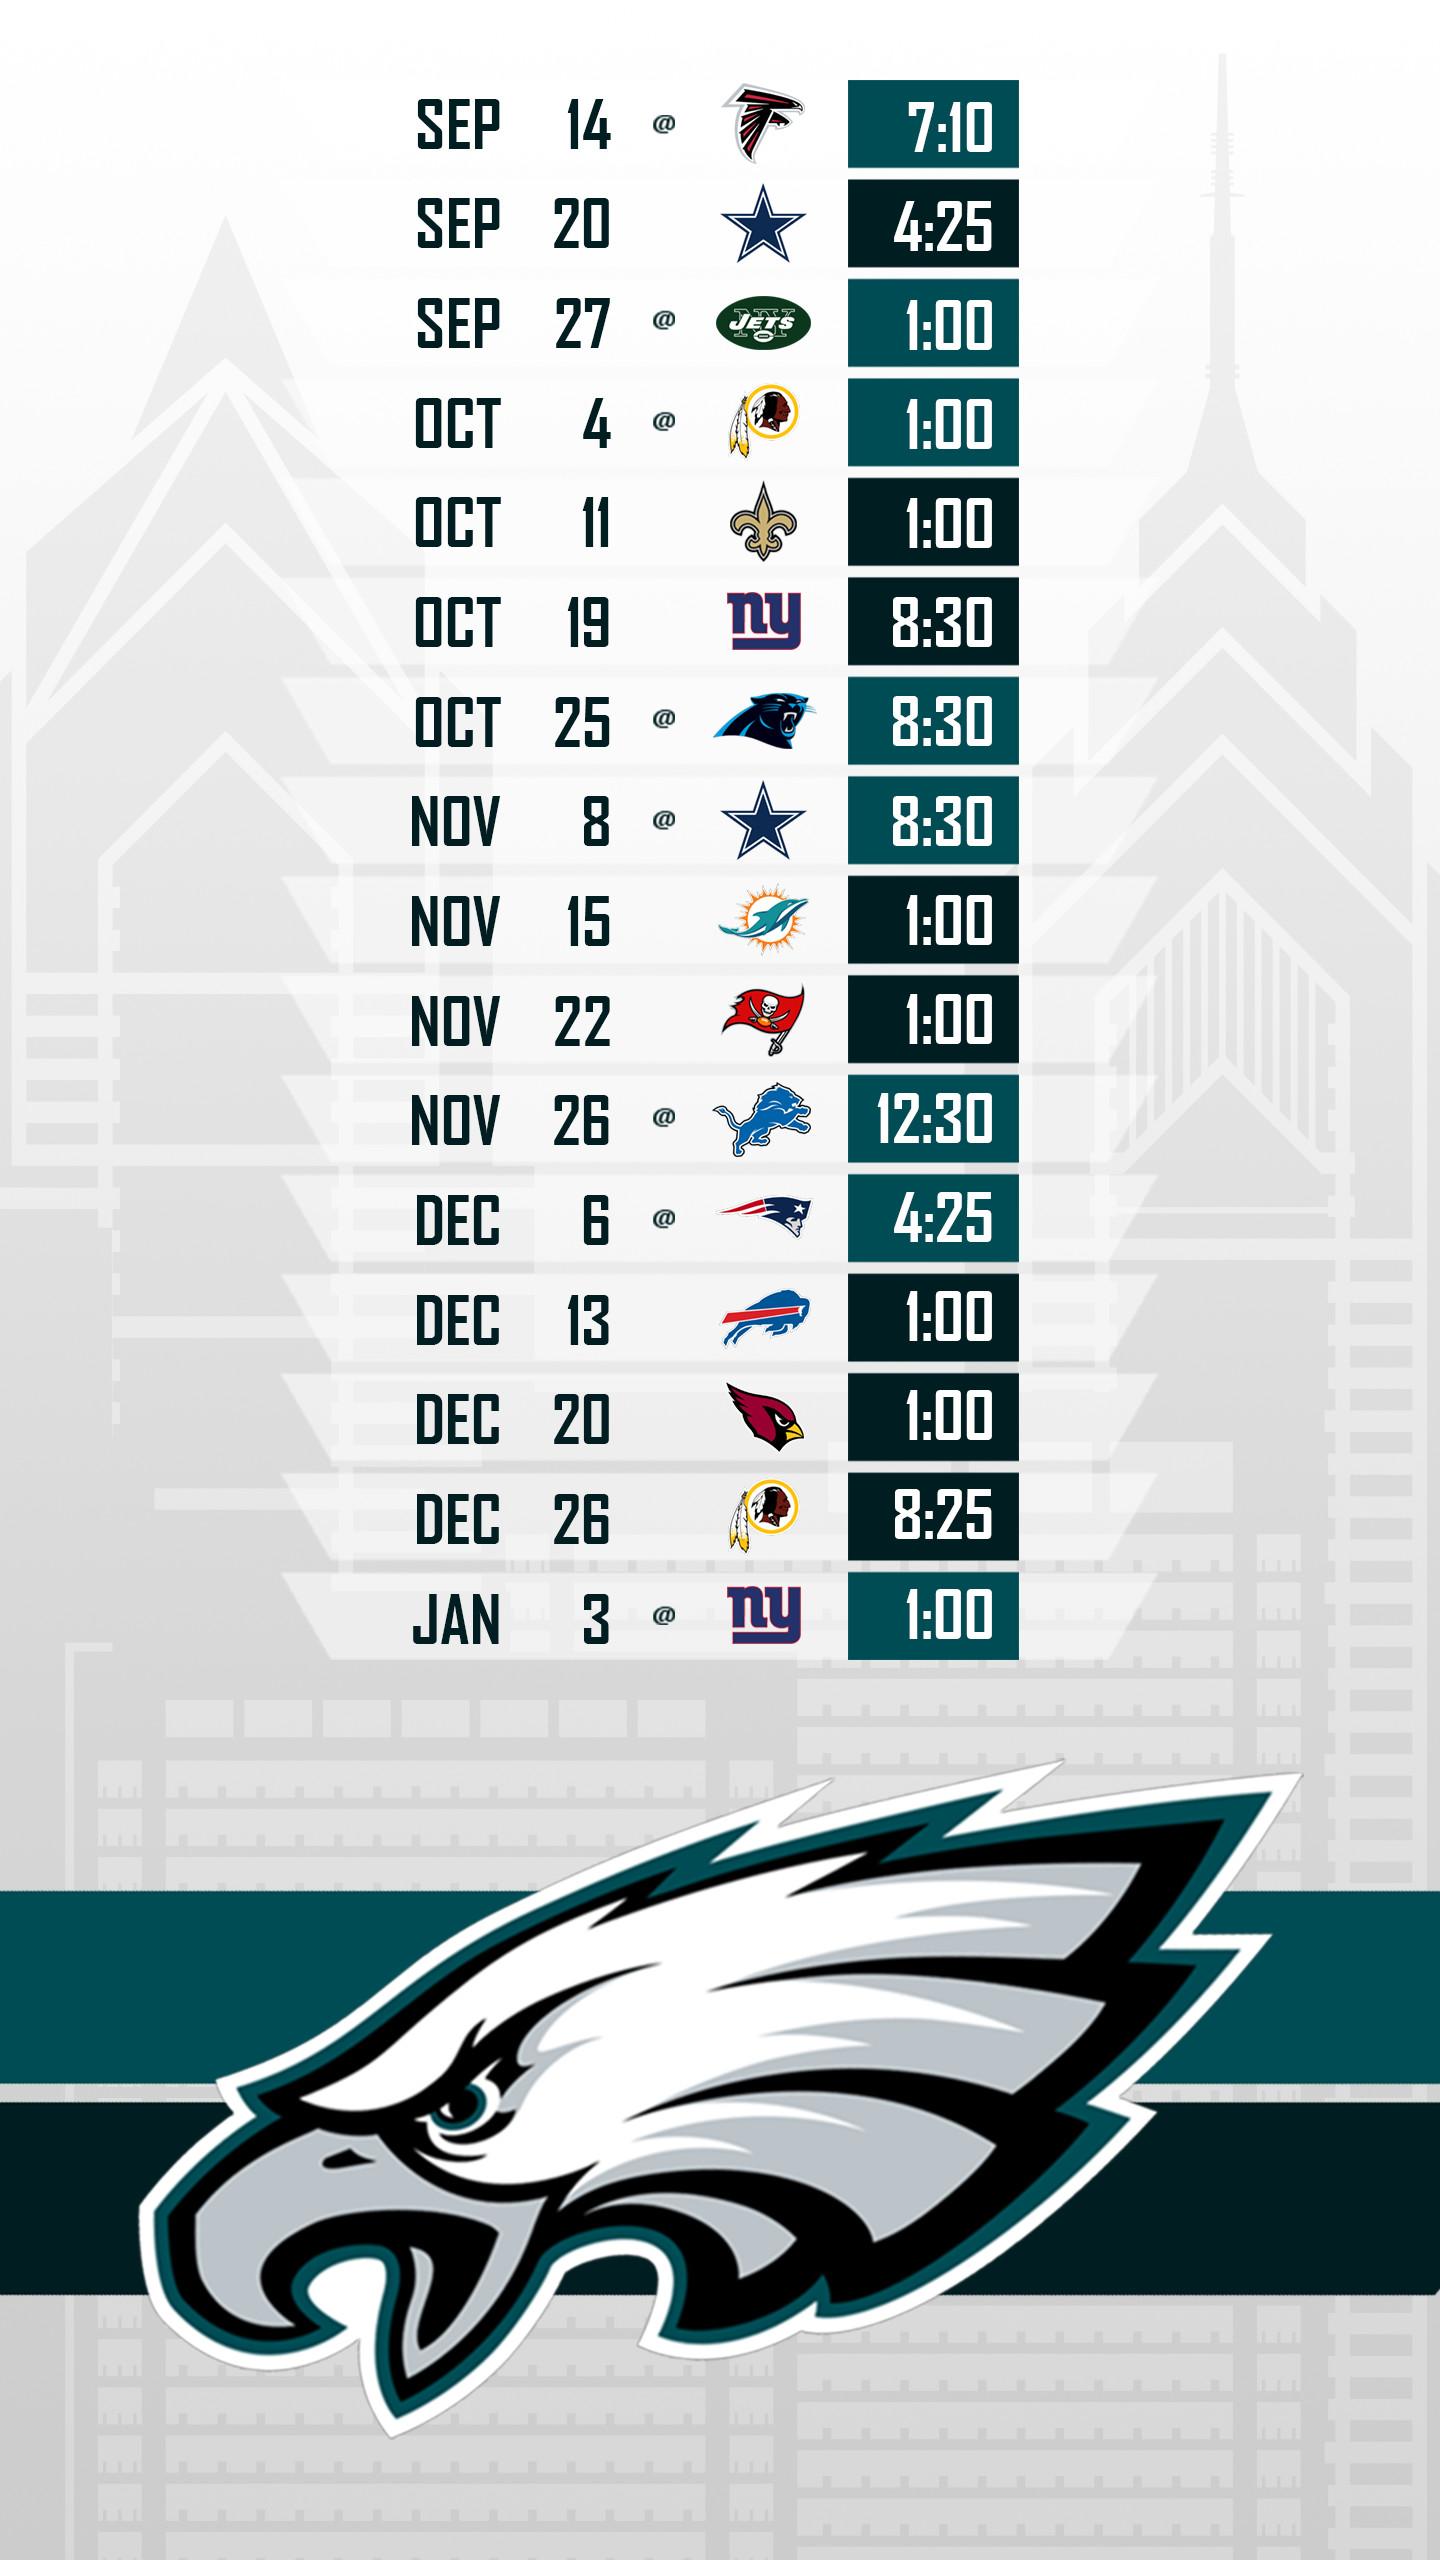 Philadelphia Eagles 2018 Schedule Wallpaper ·① WallpaperTag